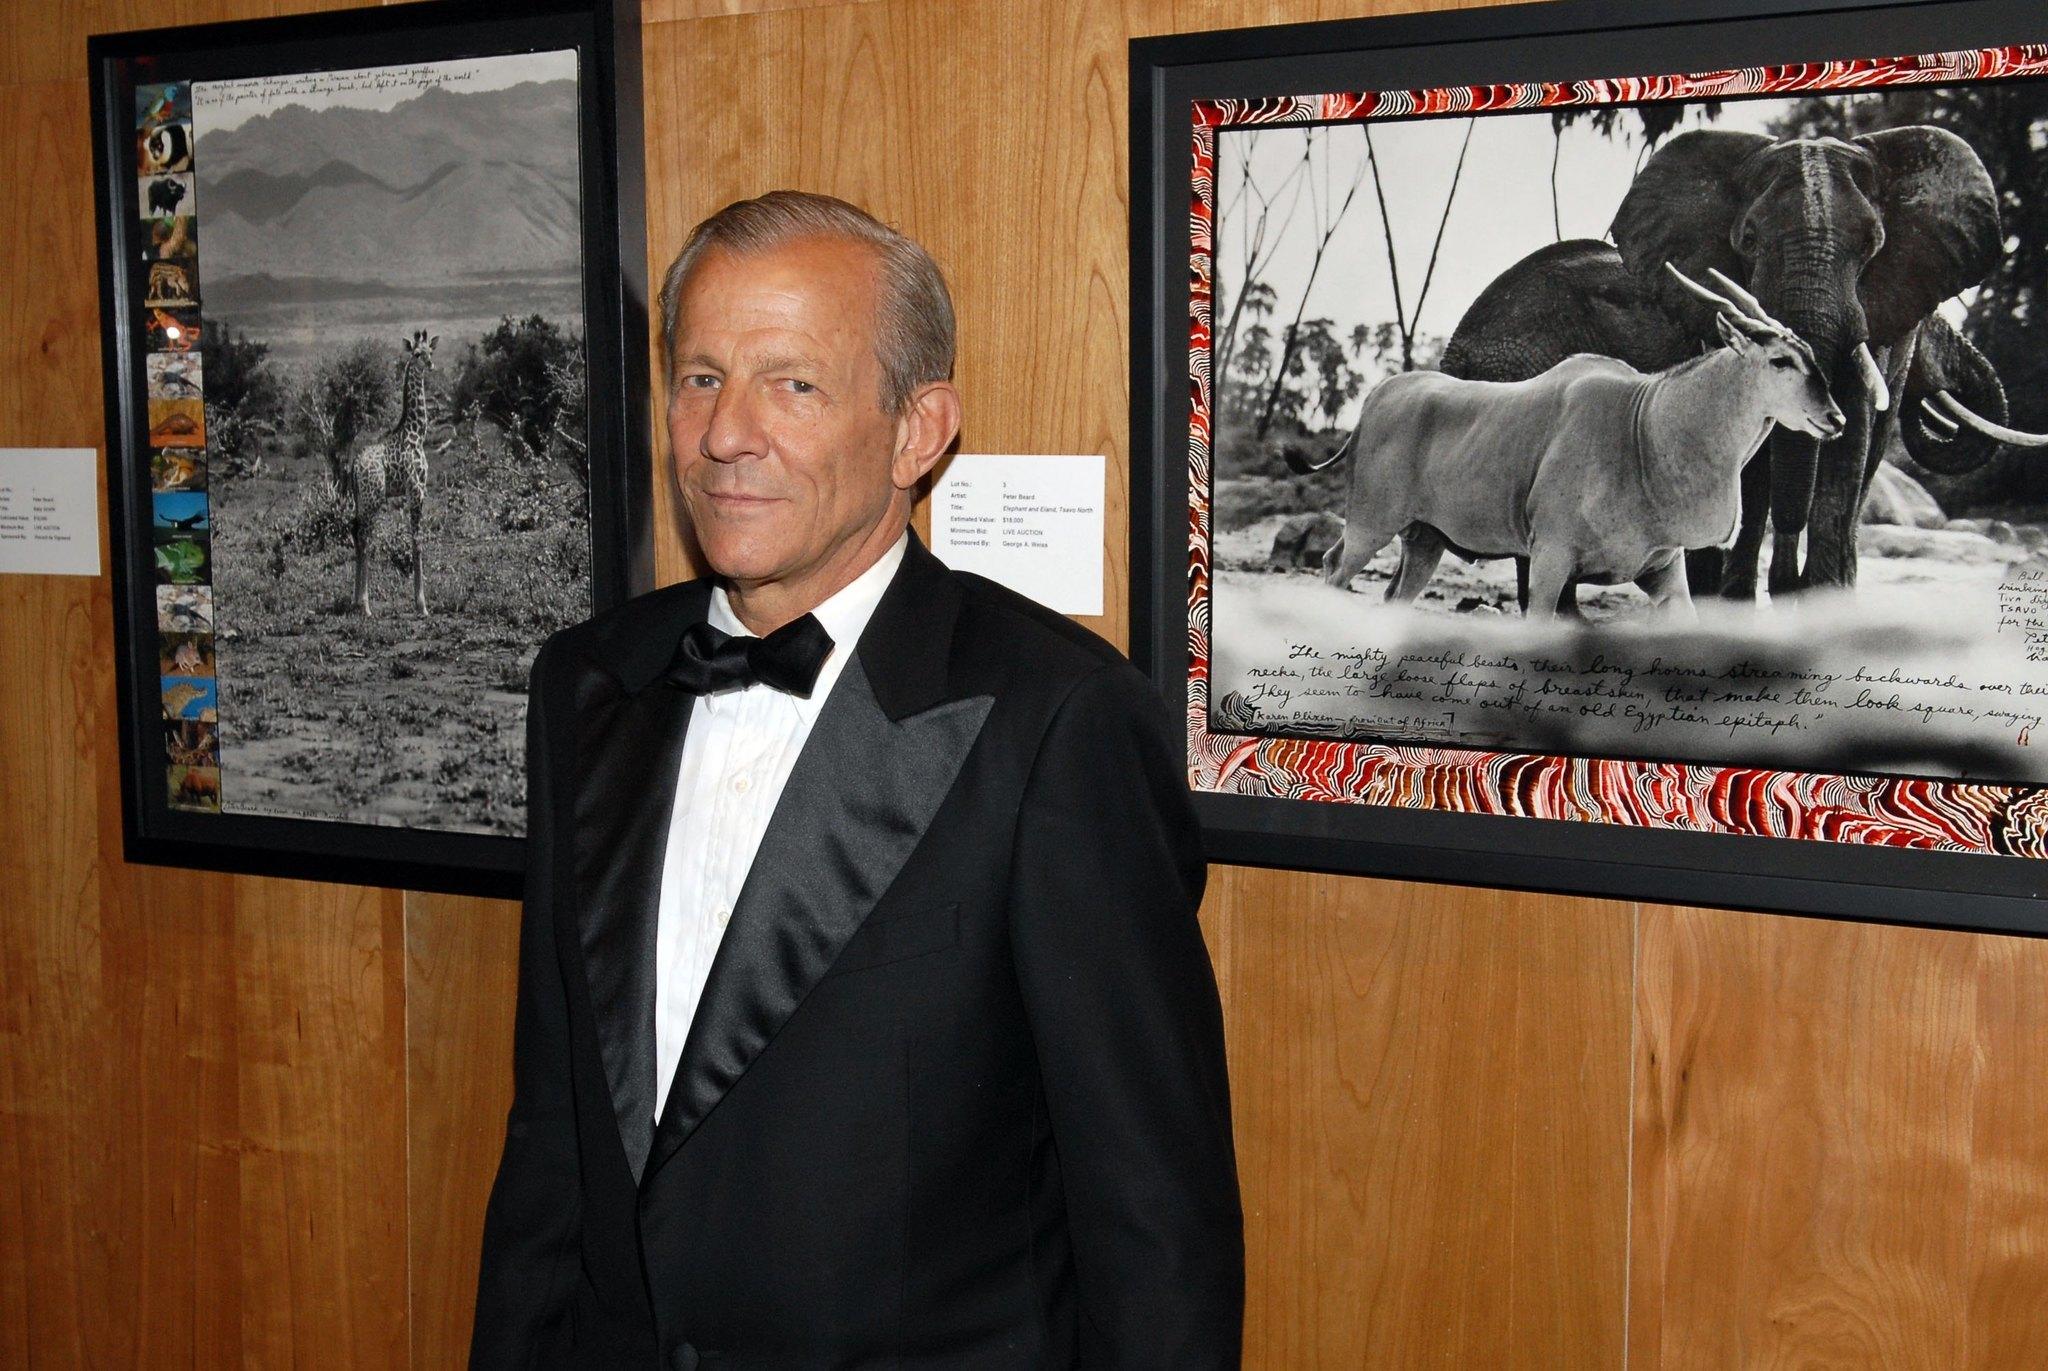 Noted photographer Peter Beard has gone missing near Montauk